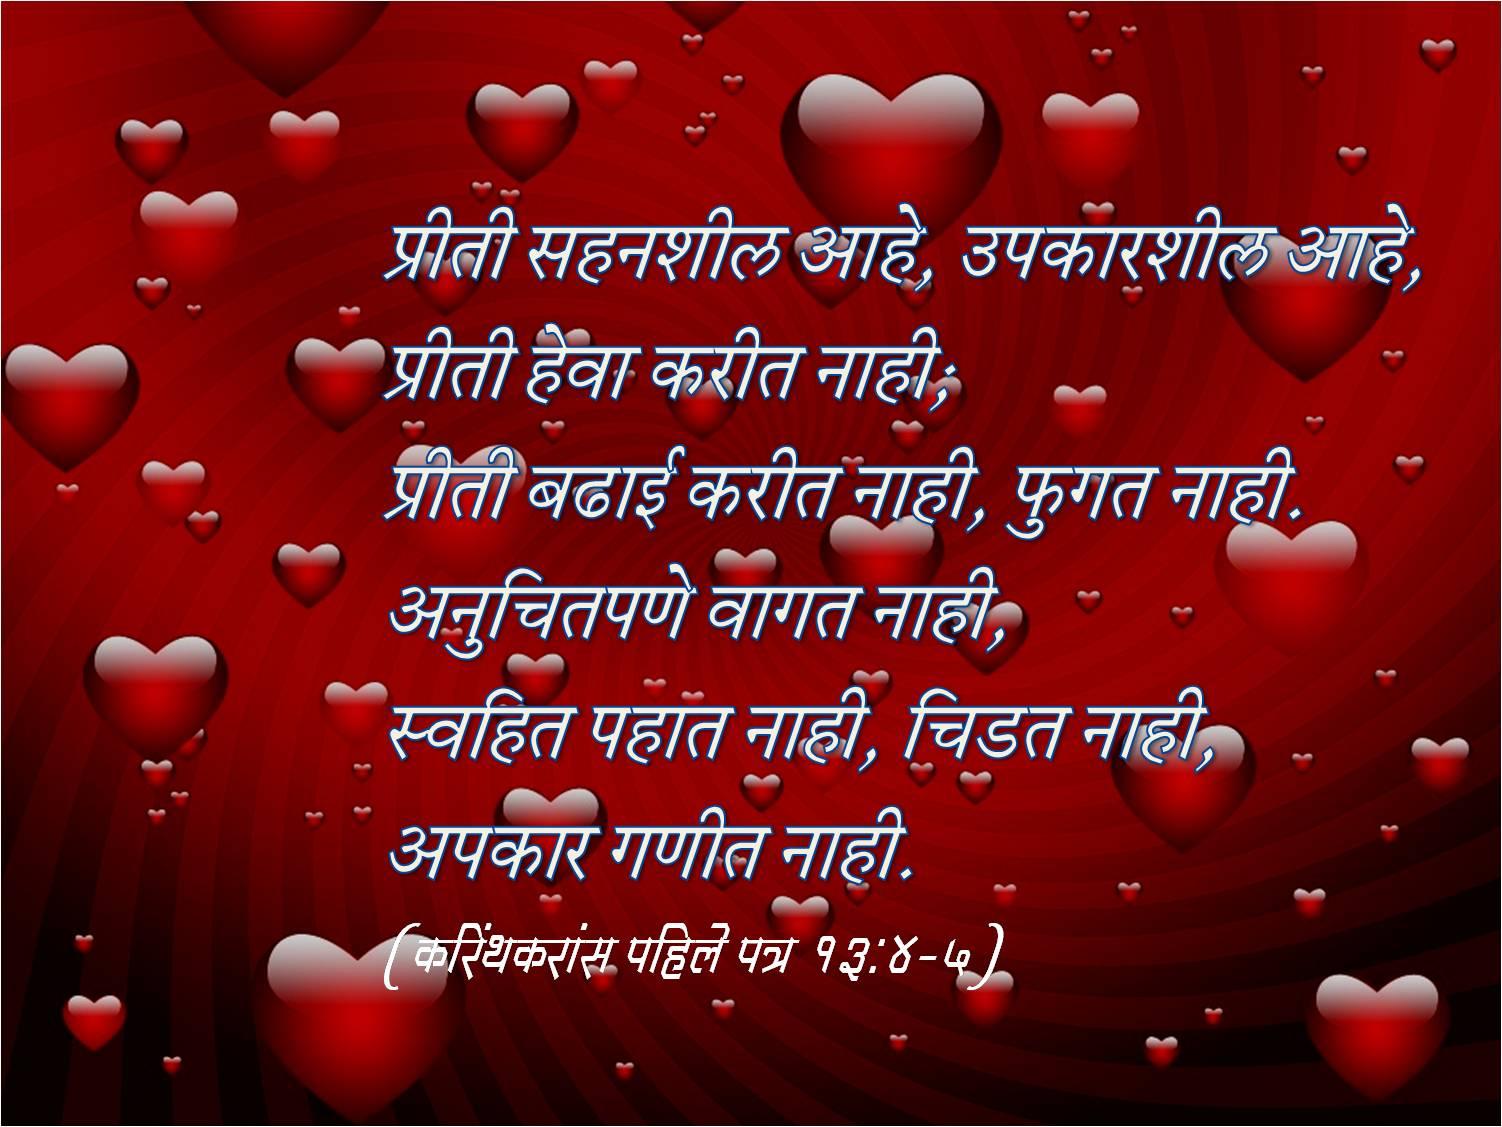 Marathi Bible Wallpapers for Valentines Day Nava Karar (Marathi ...